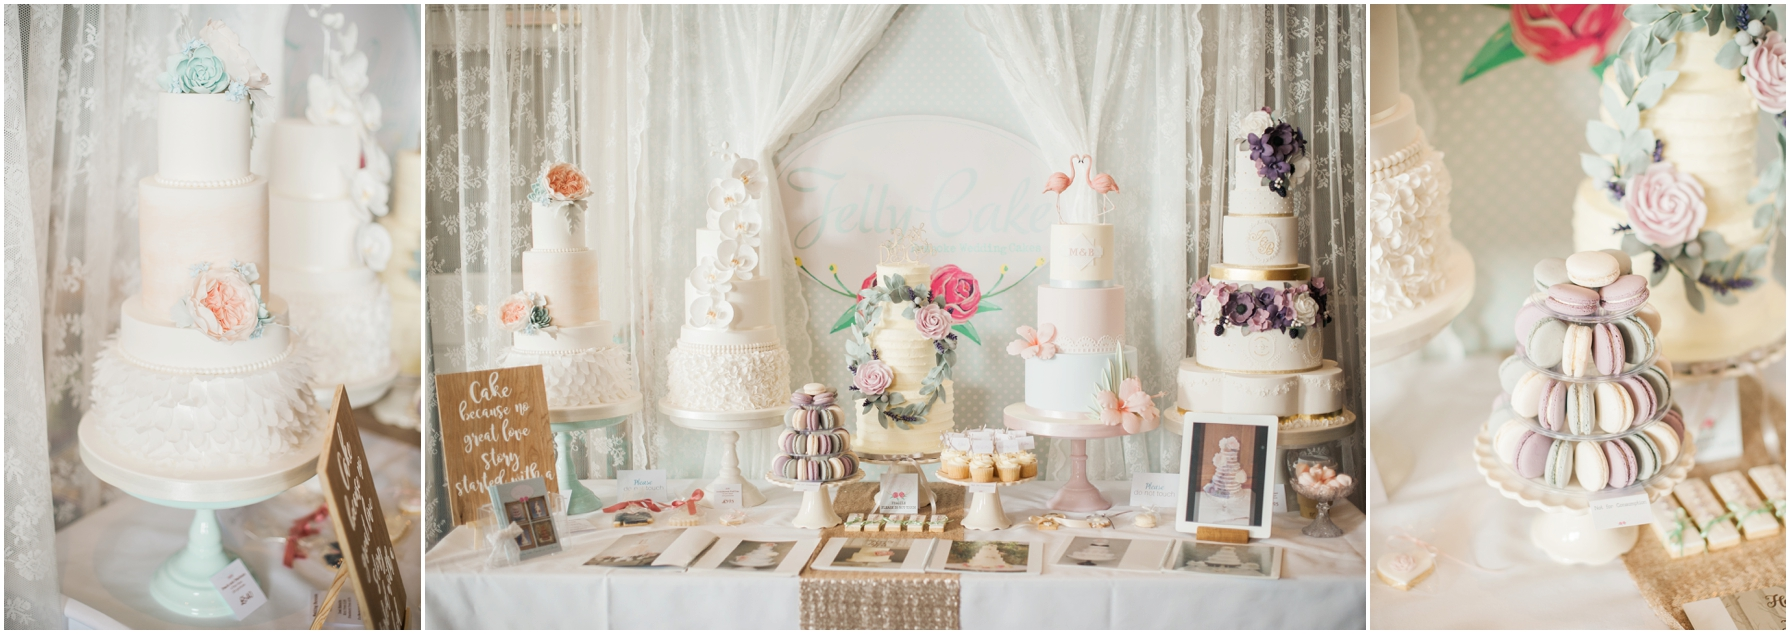 jelly cake wedding cakes